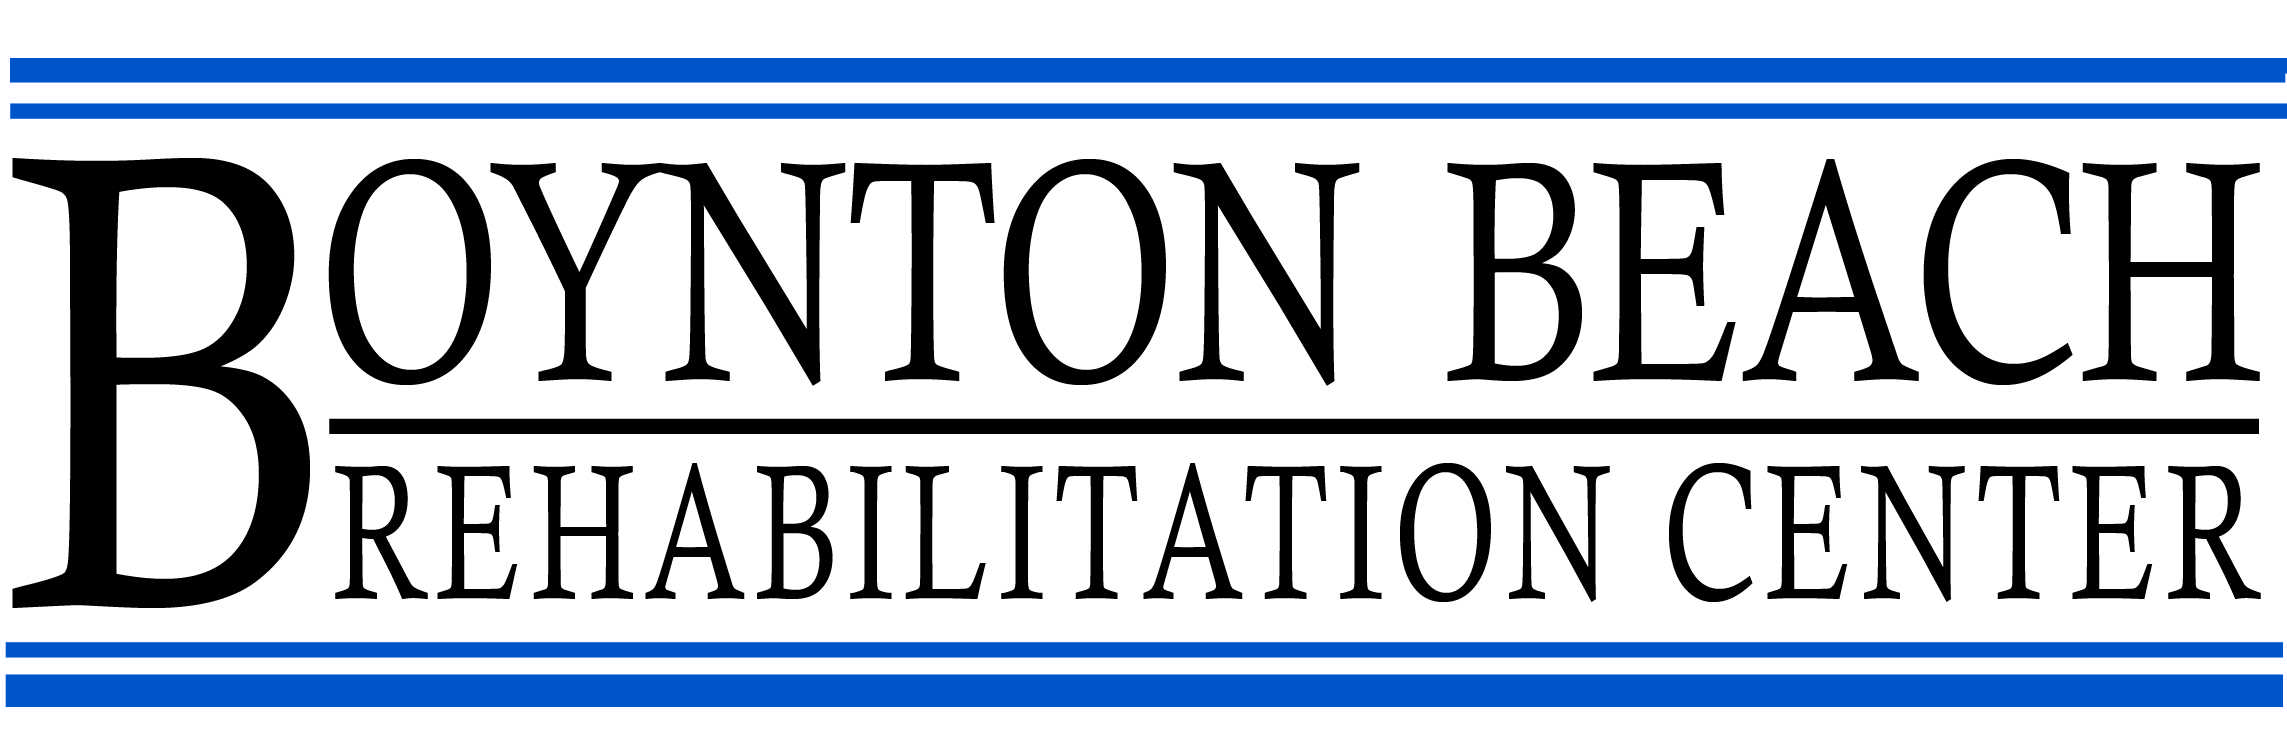 Boynton Beach Rehab logo